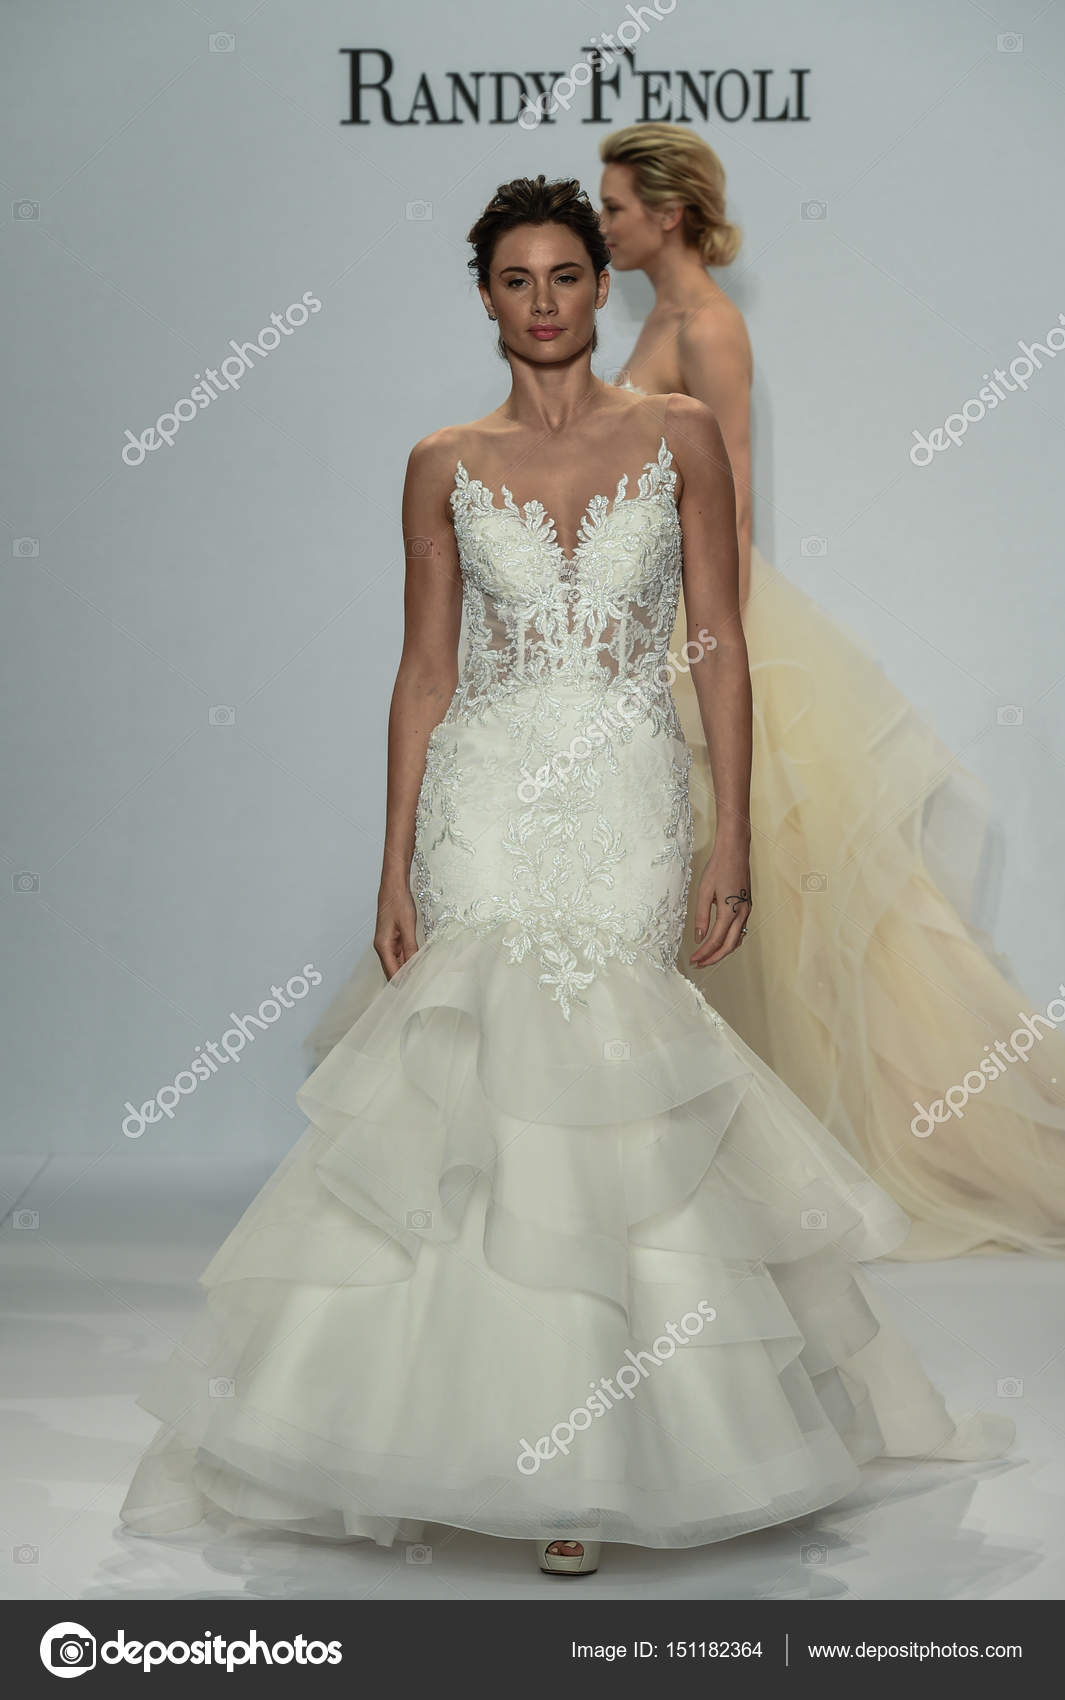 Voir La Randy Fenoli Bridal Photo éditoriale Fashionstock 151182364